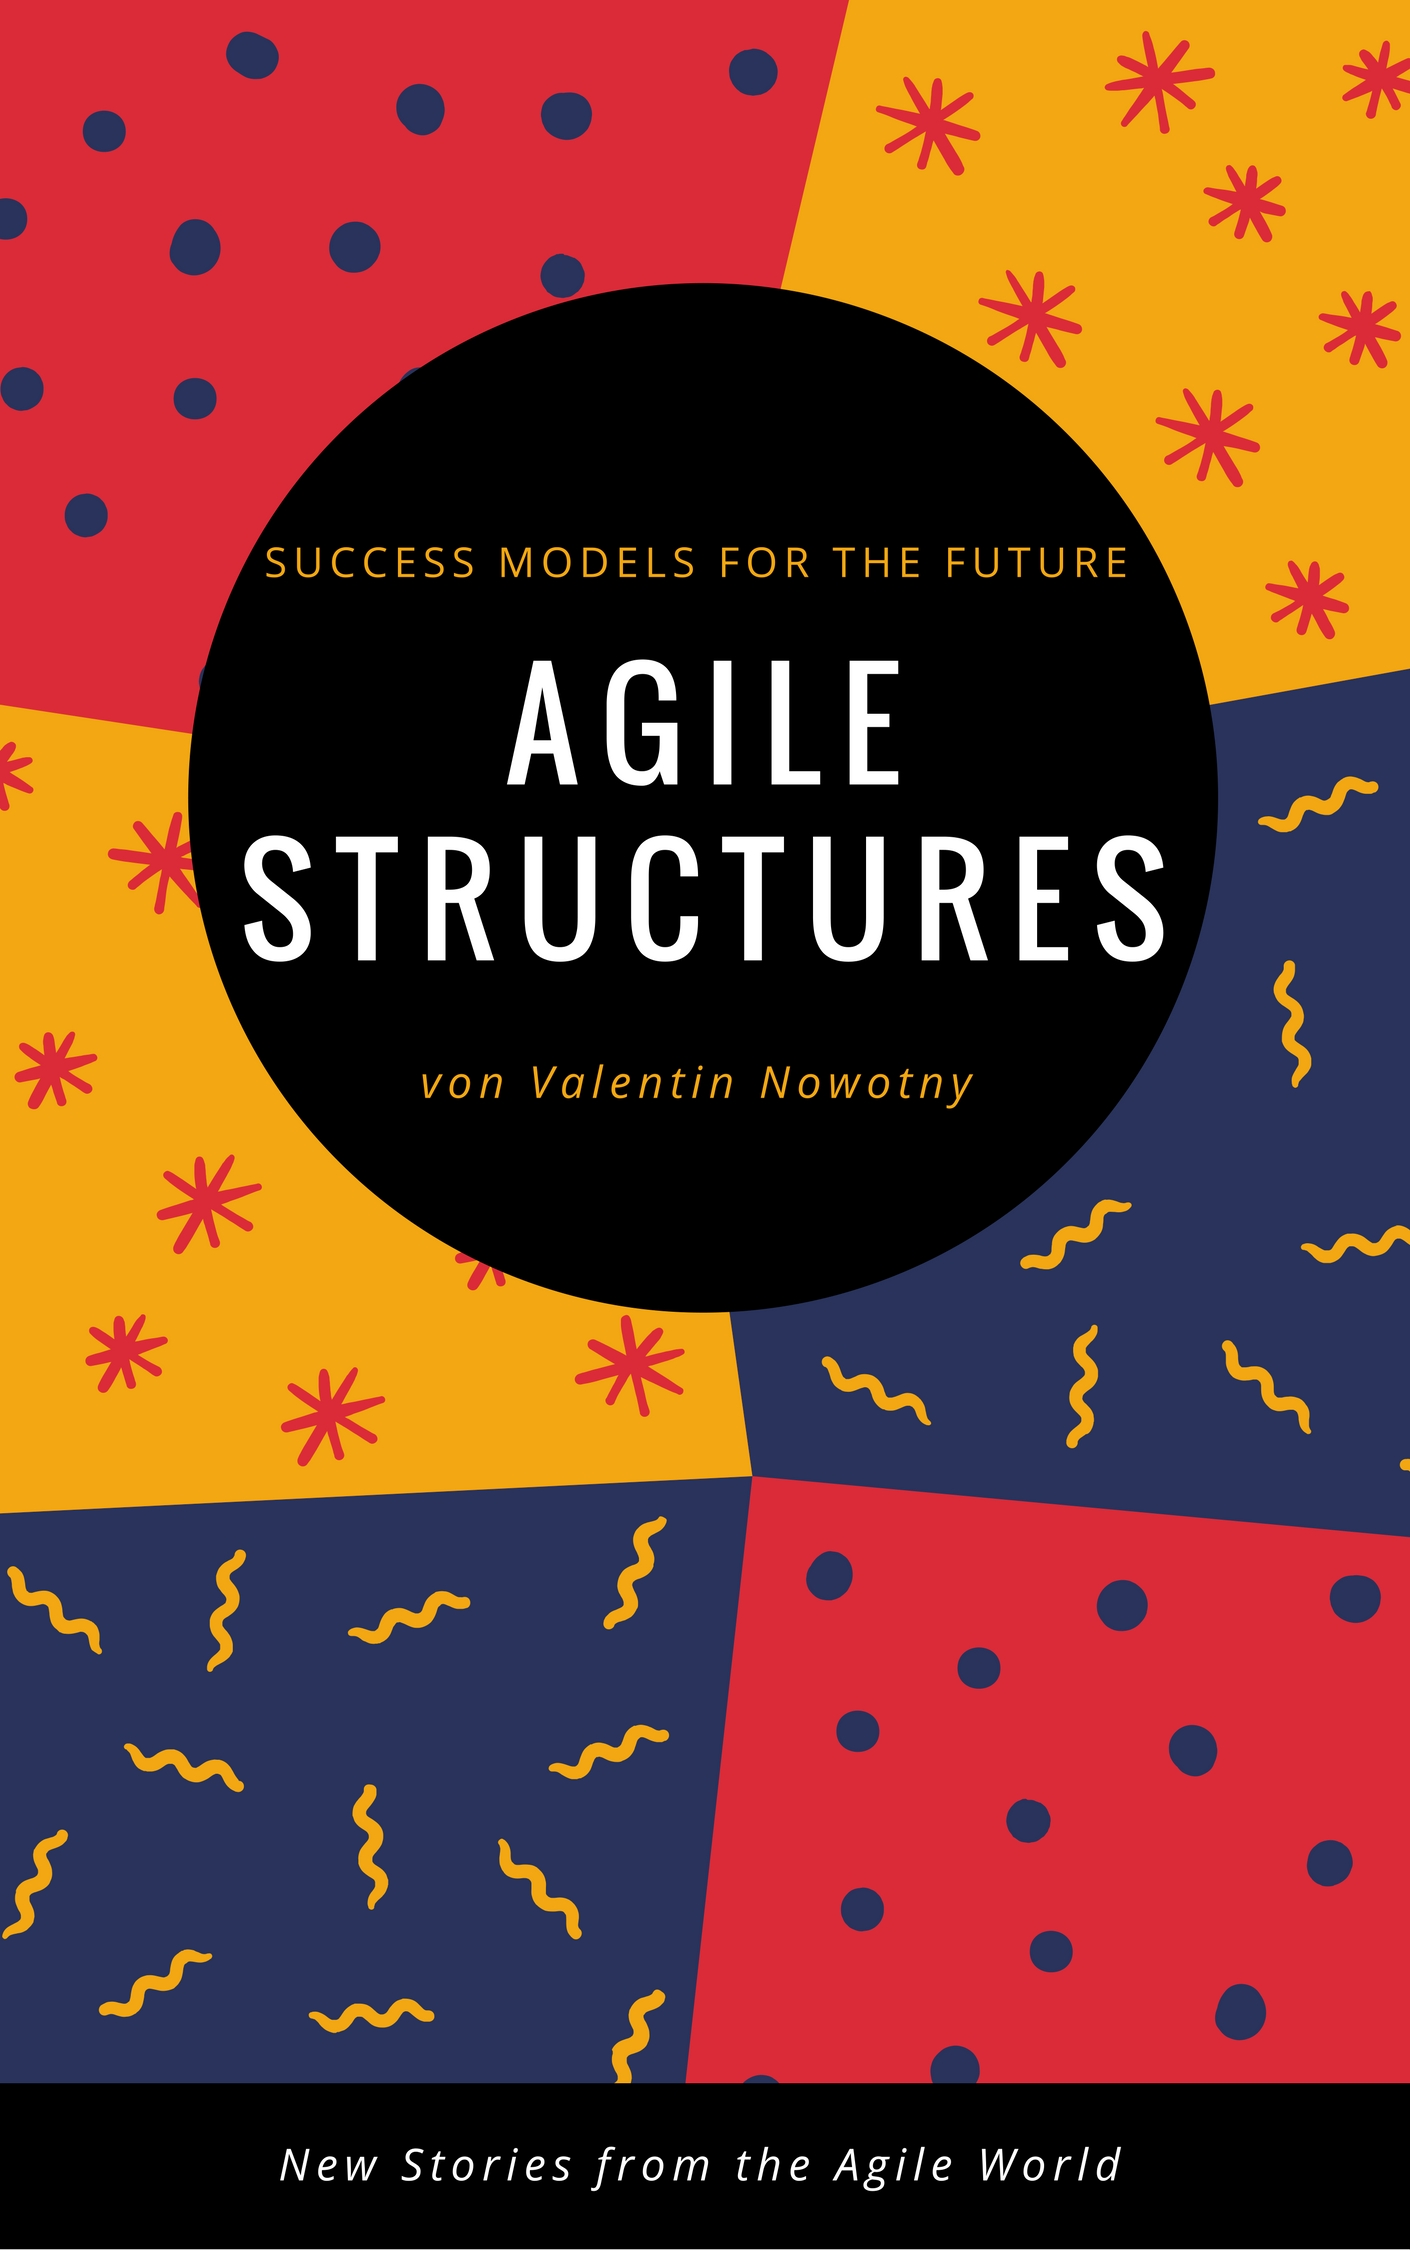 Agile Strukturres_ Success Models of the Future (1).jpg